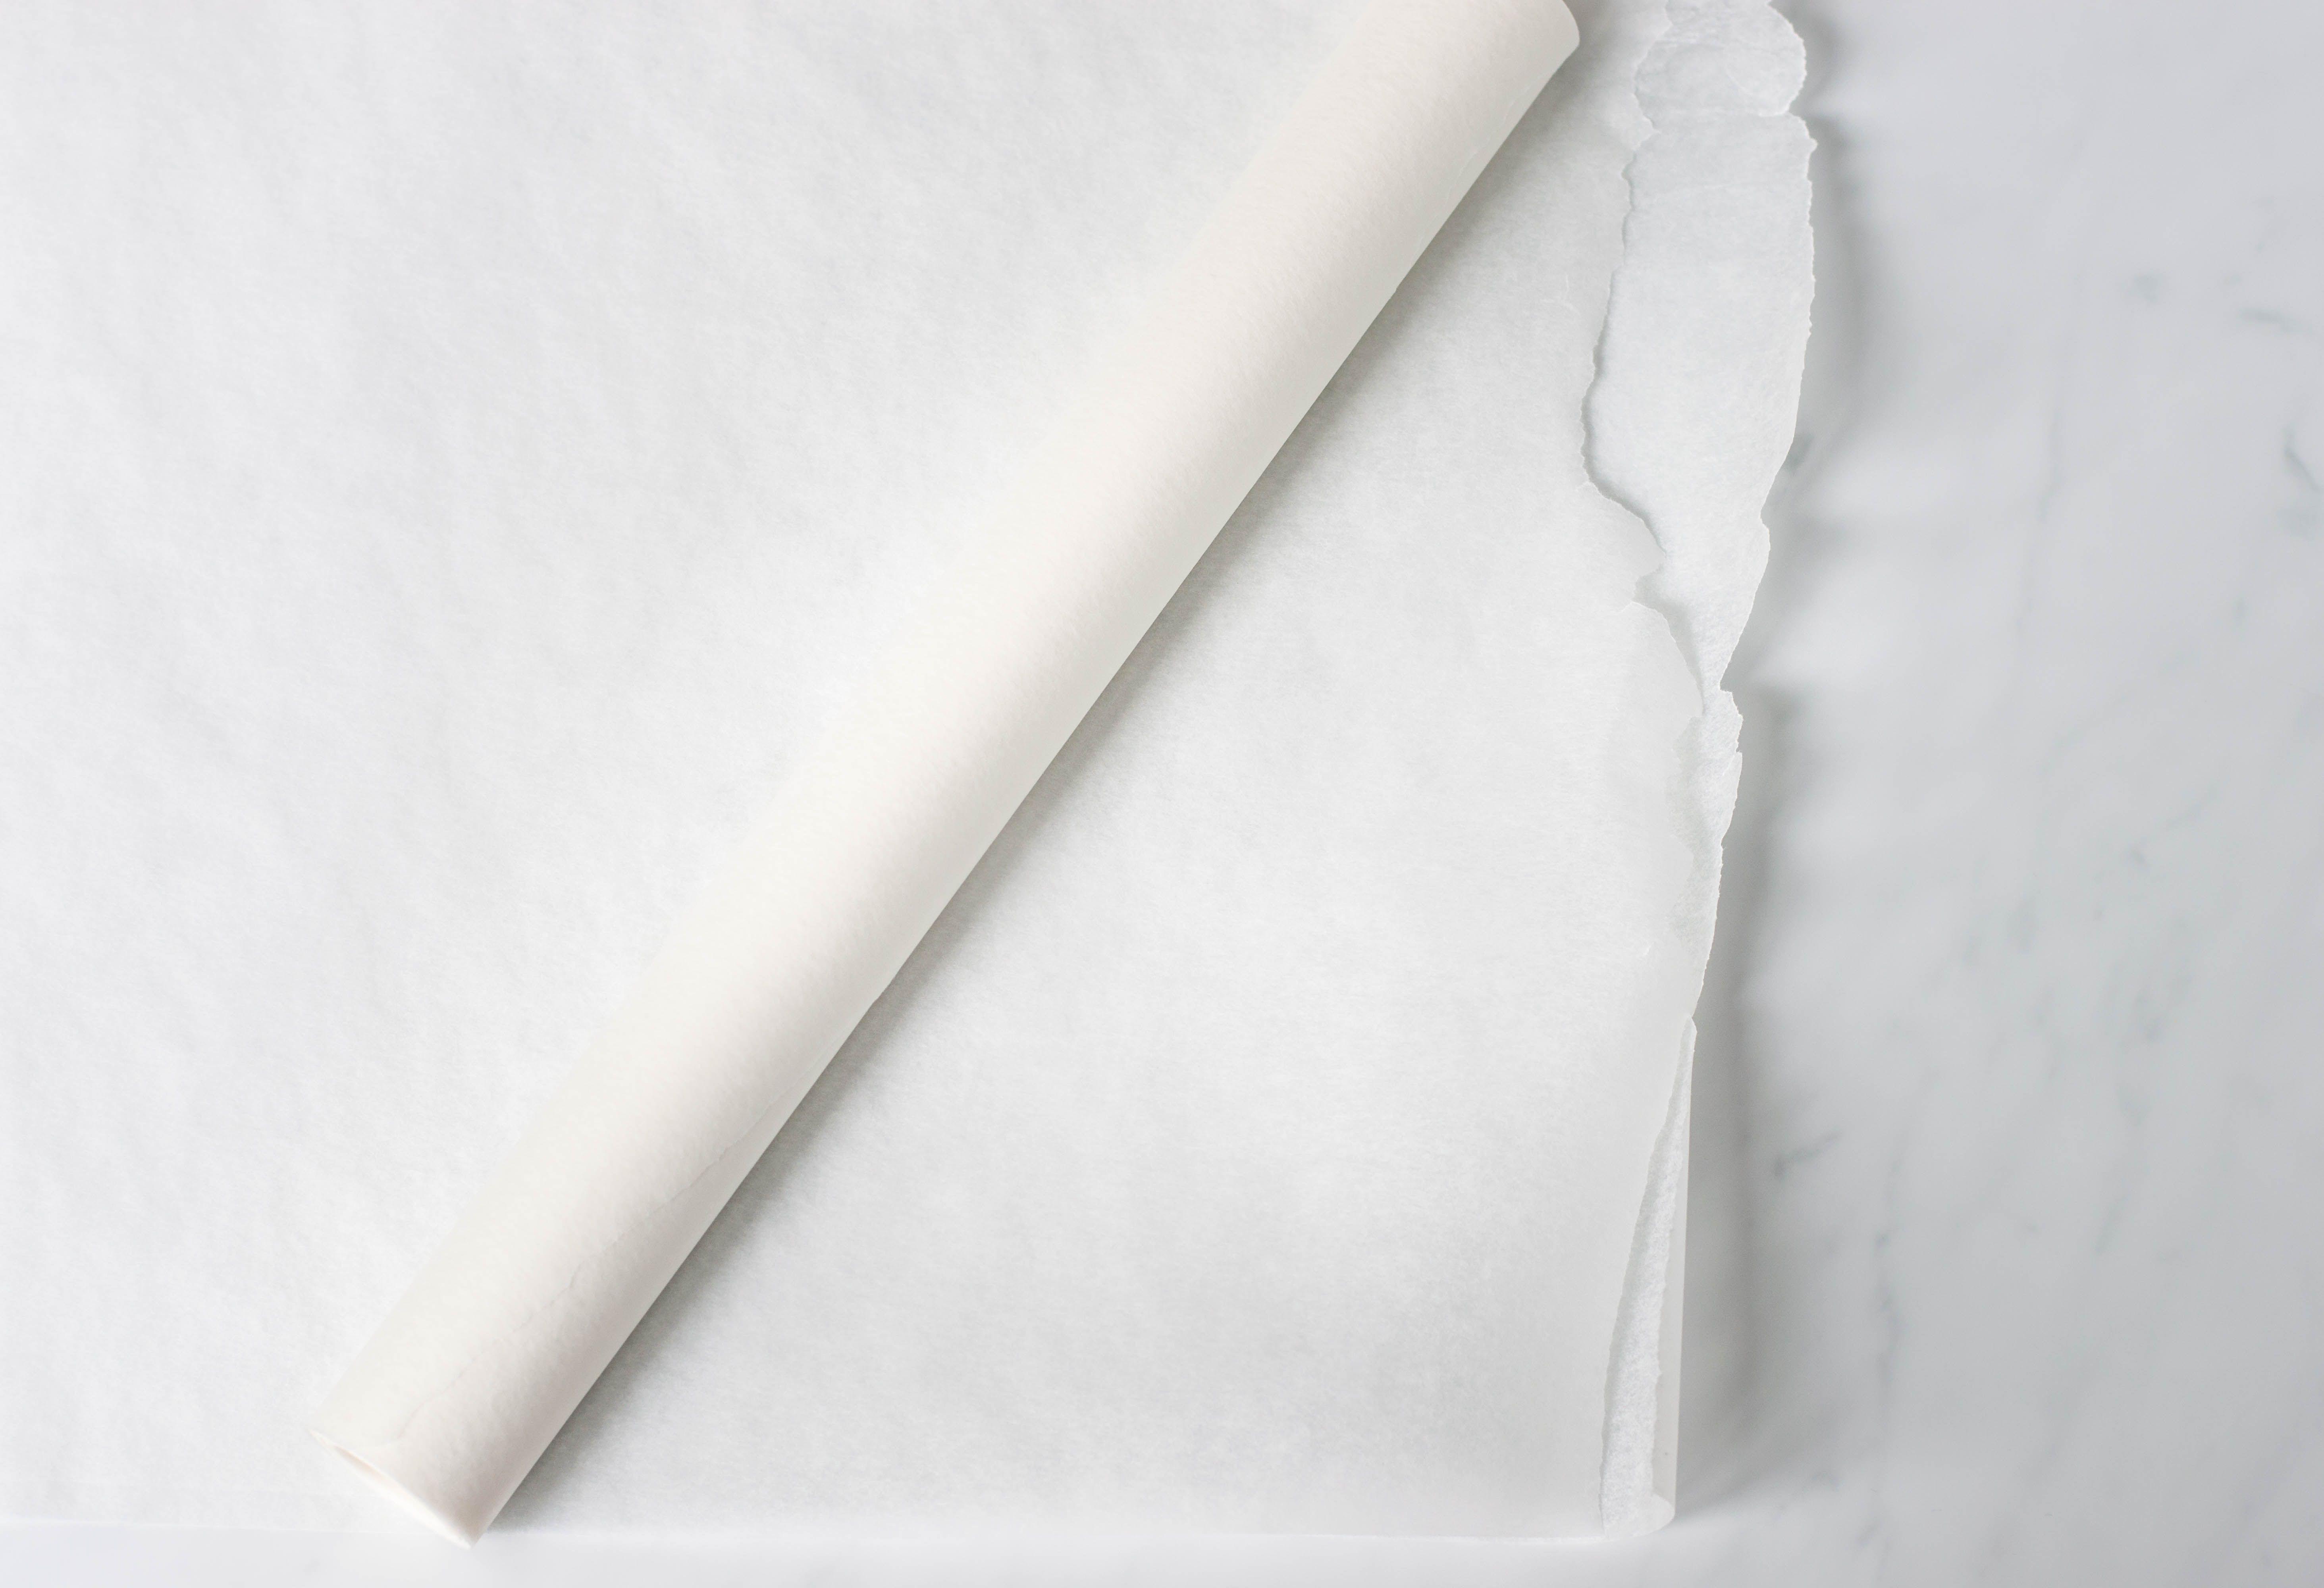 Wax paper on countertop